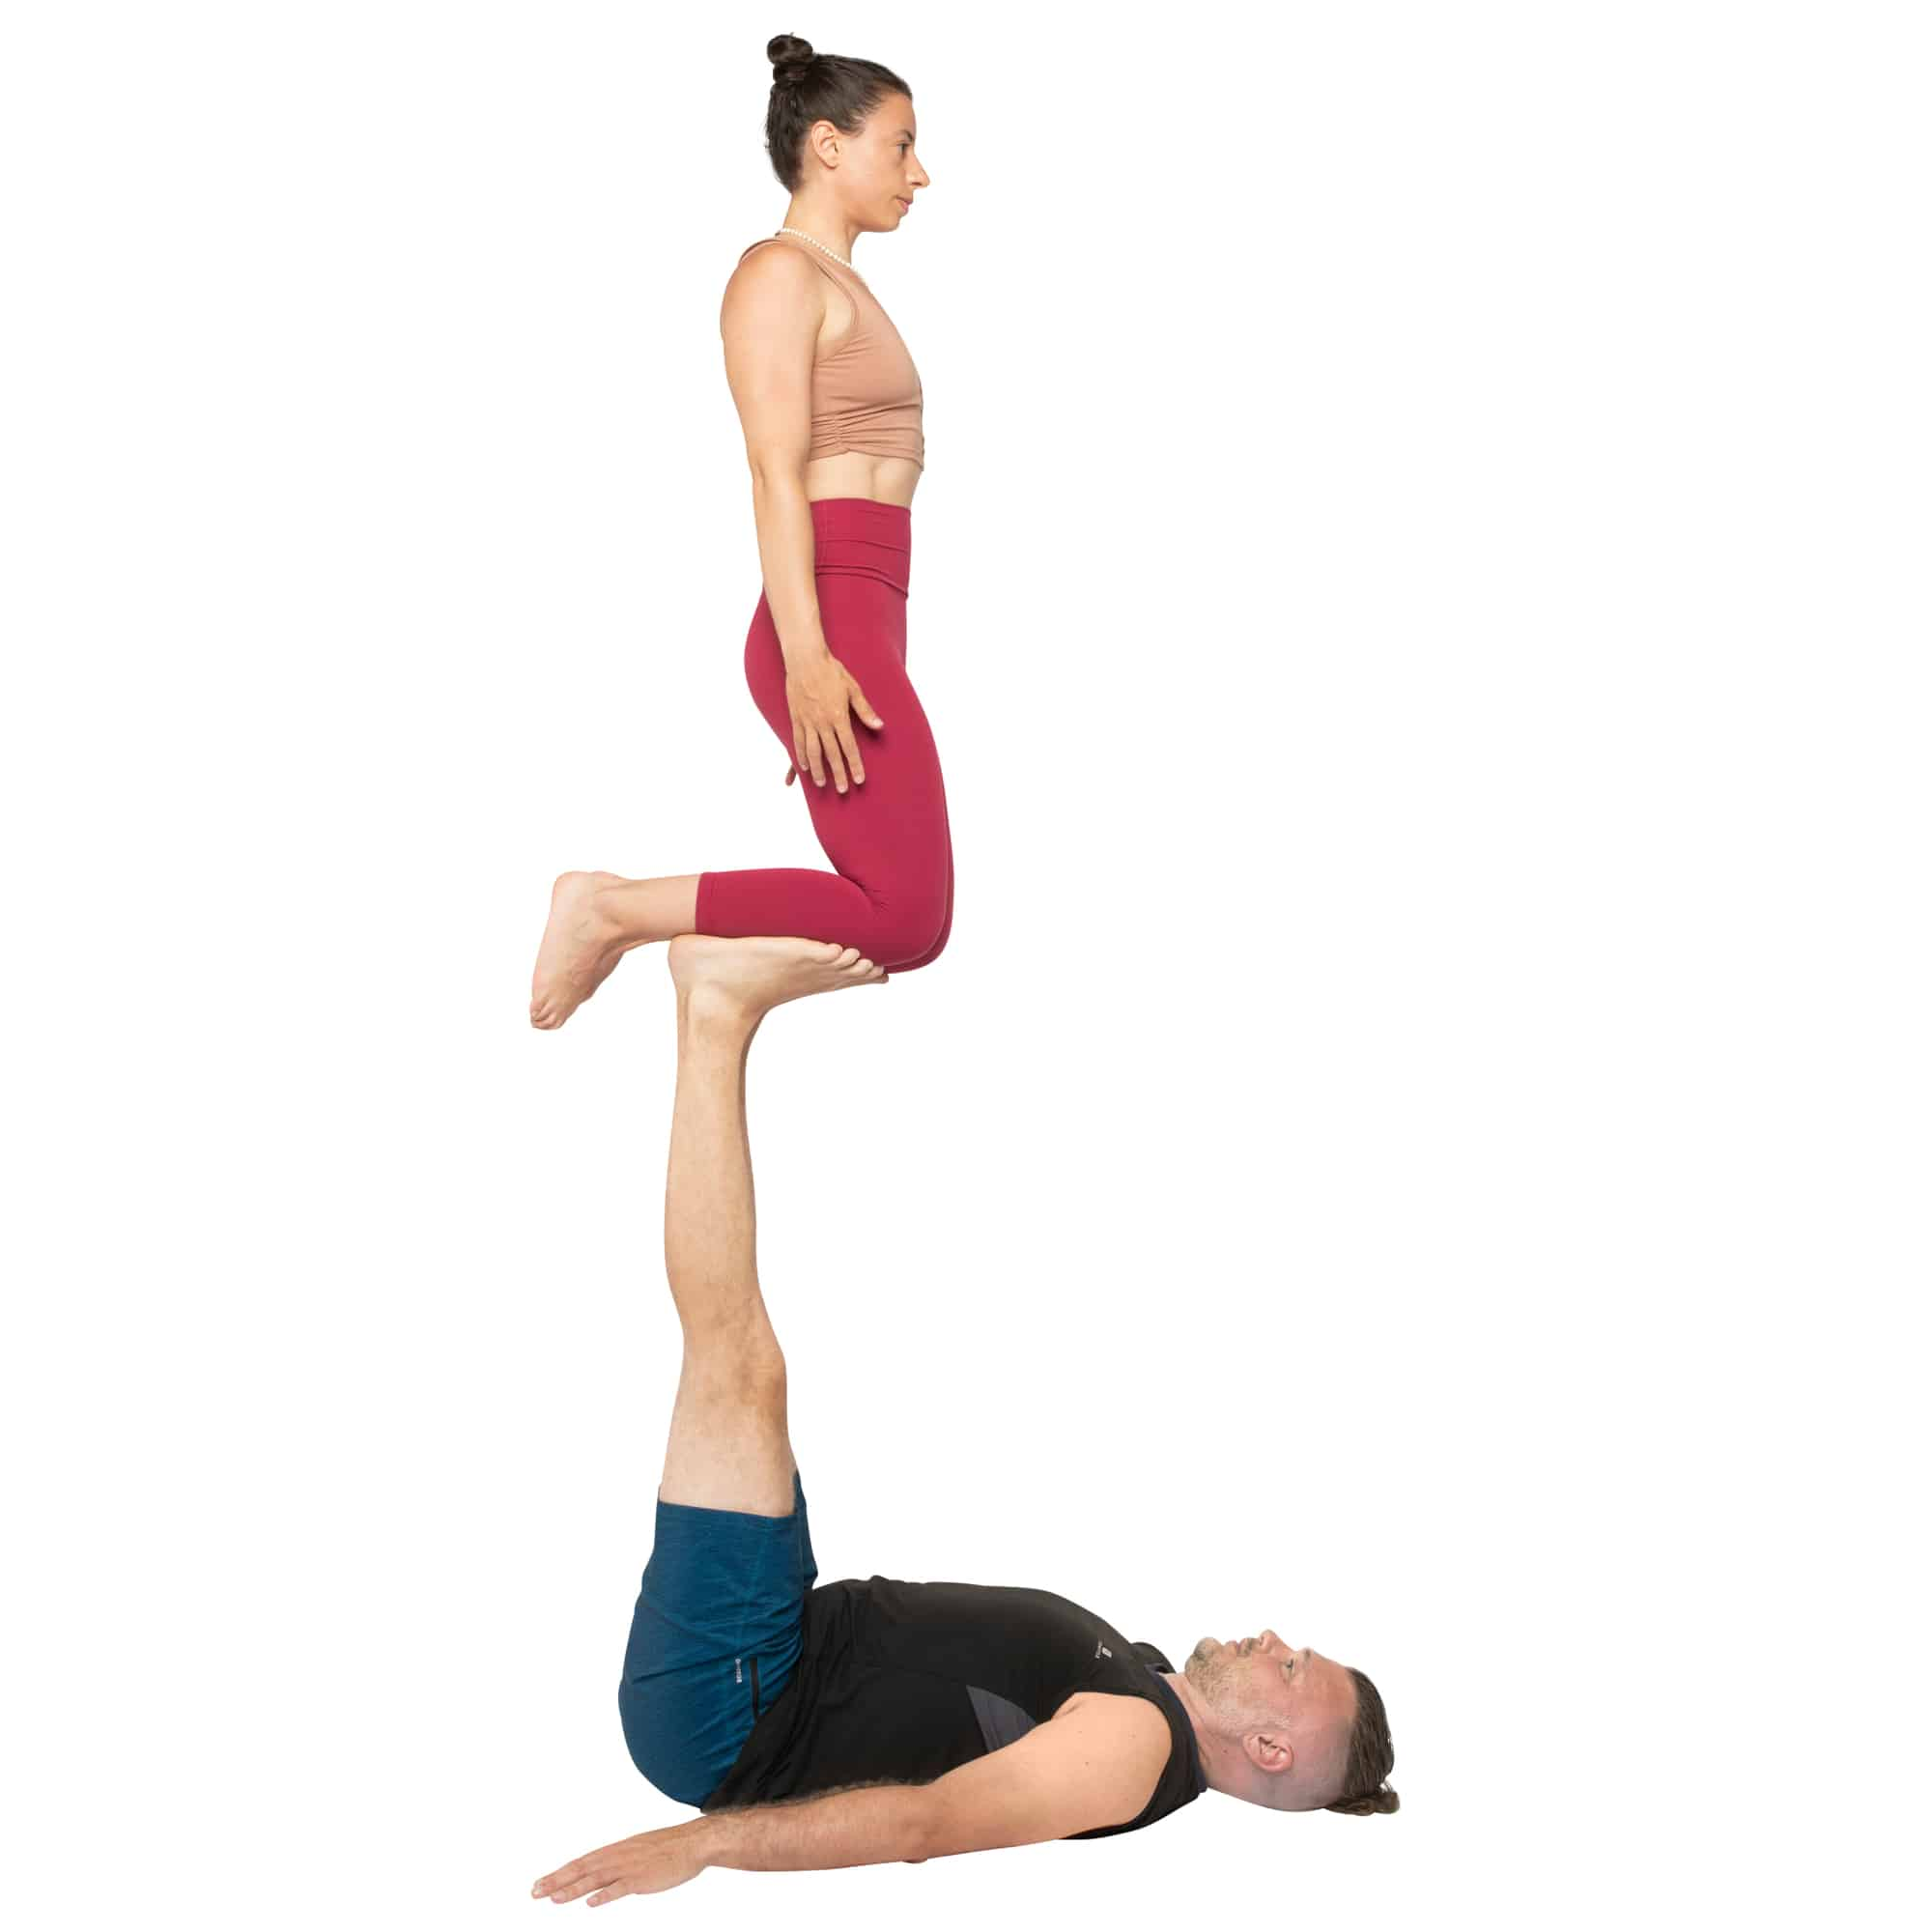 acroyoga haltung pose Shin to Foot